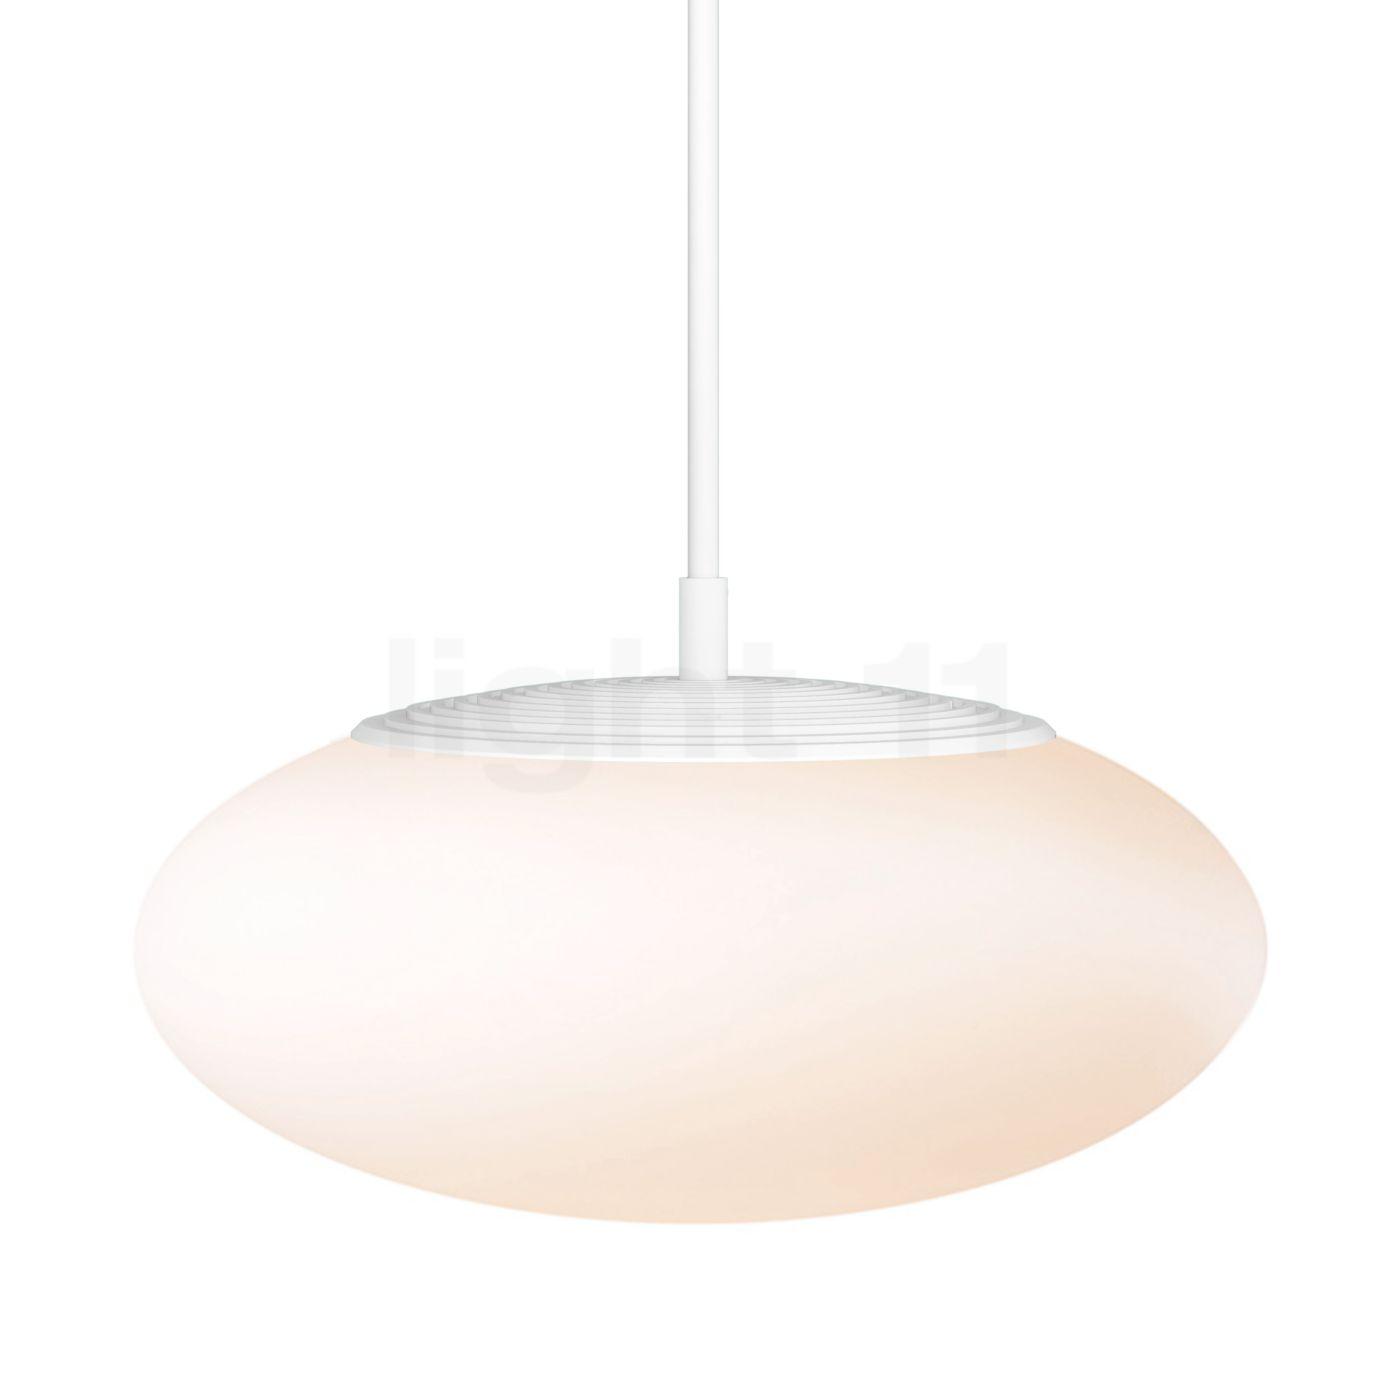 Mawa Humboldt Pendelleuchte LED, opal, 70 W hu 3-4